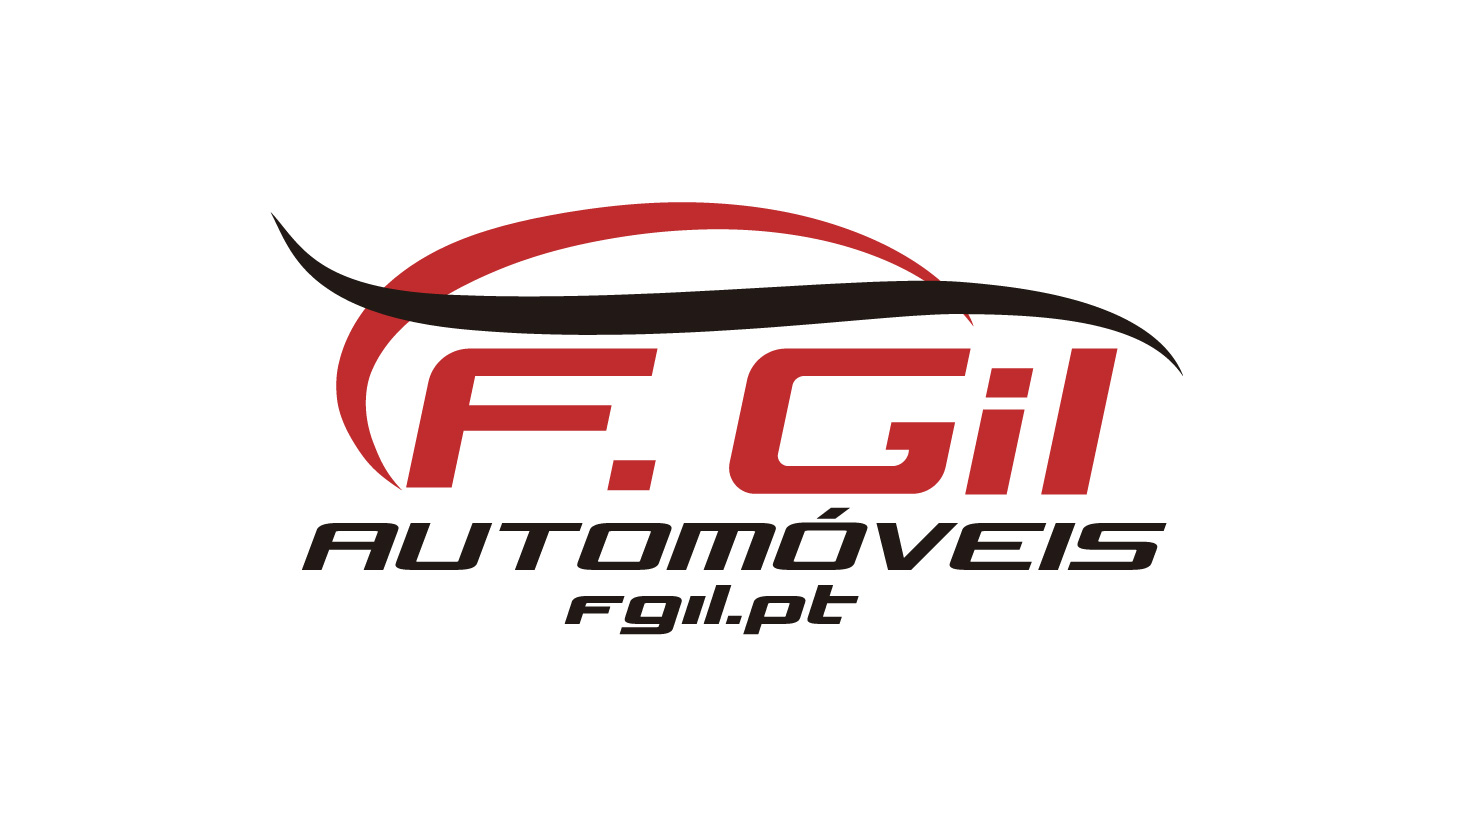 Indigus - FGil-15